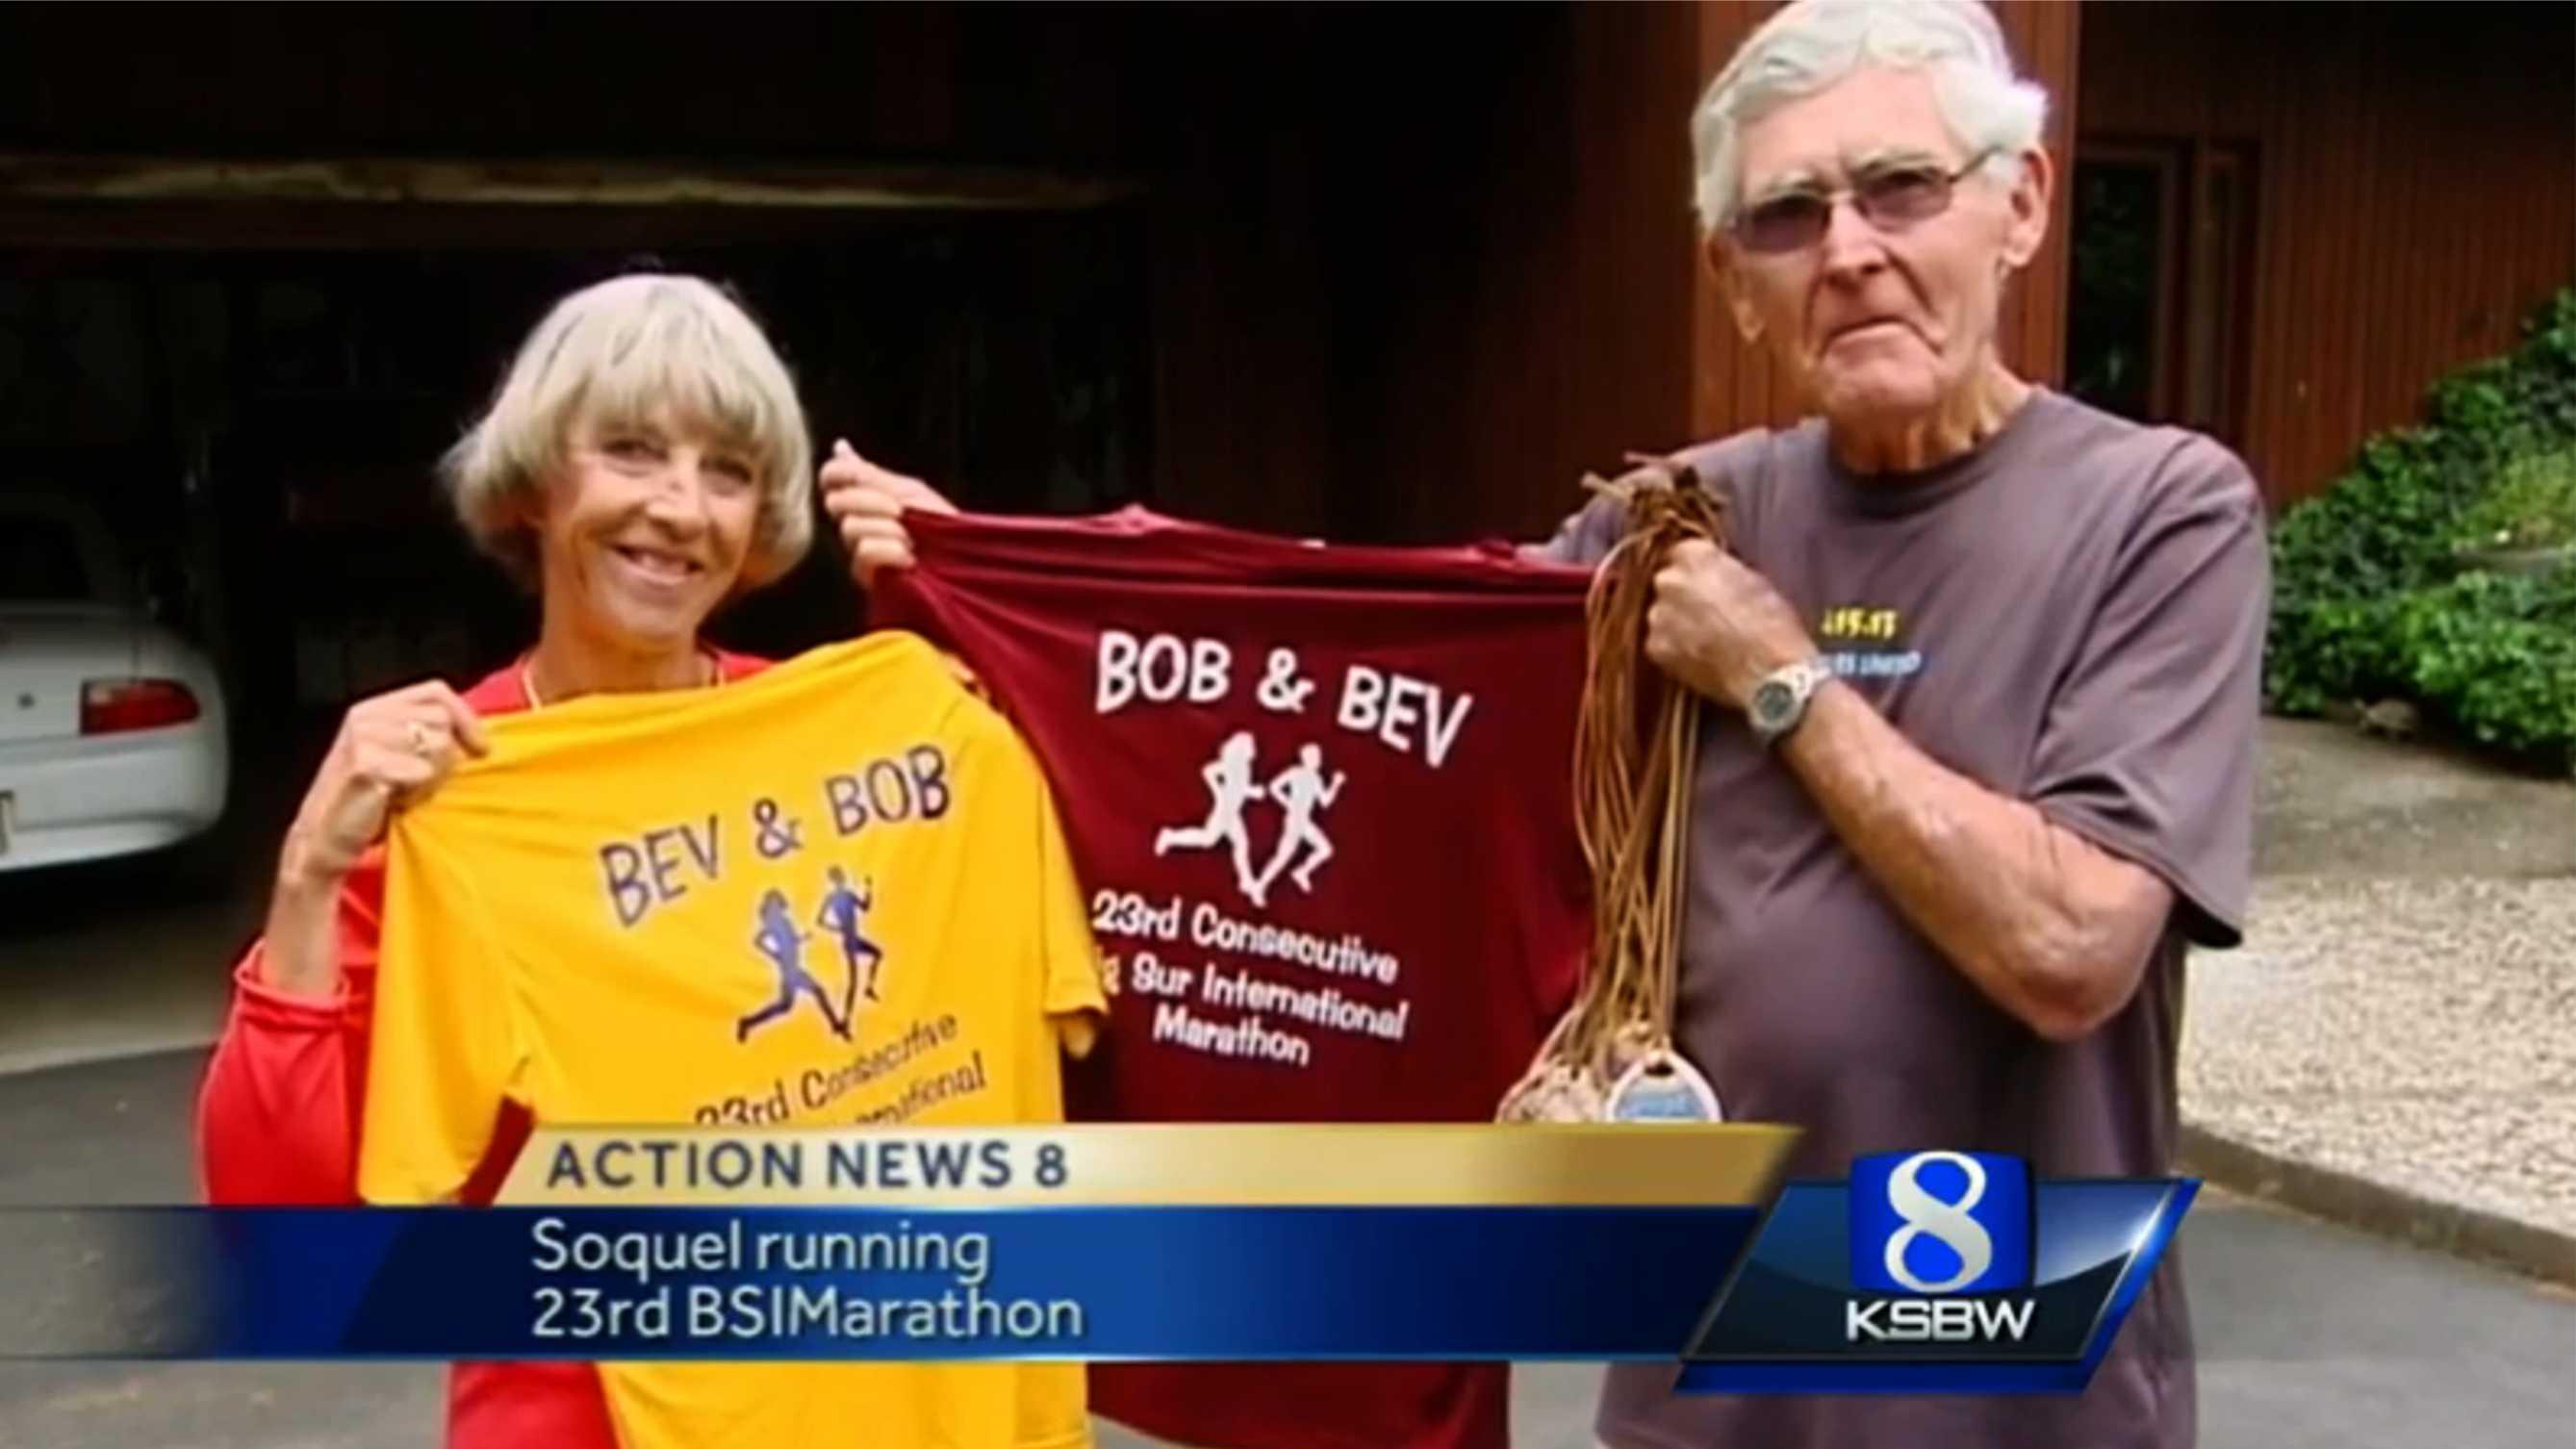 Bev and Bob